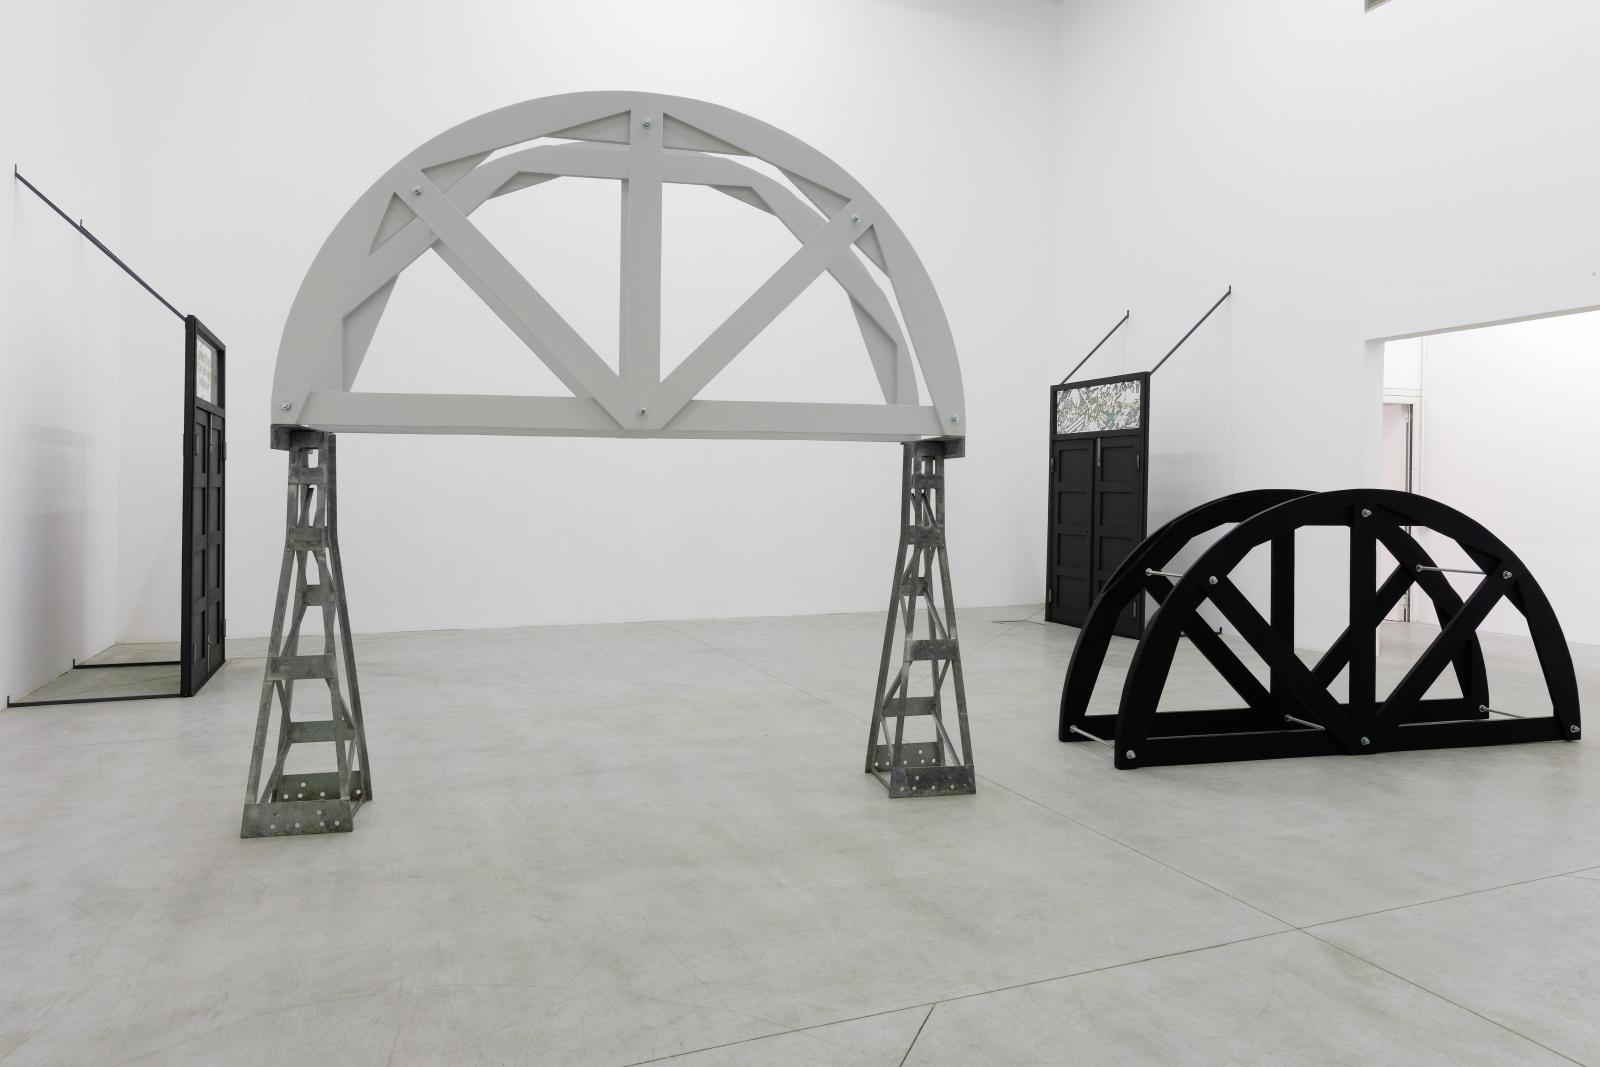 Valerie Snobeck, 2018, exhibition view. © André Morin / Consortium Museum